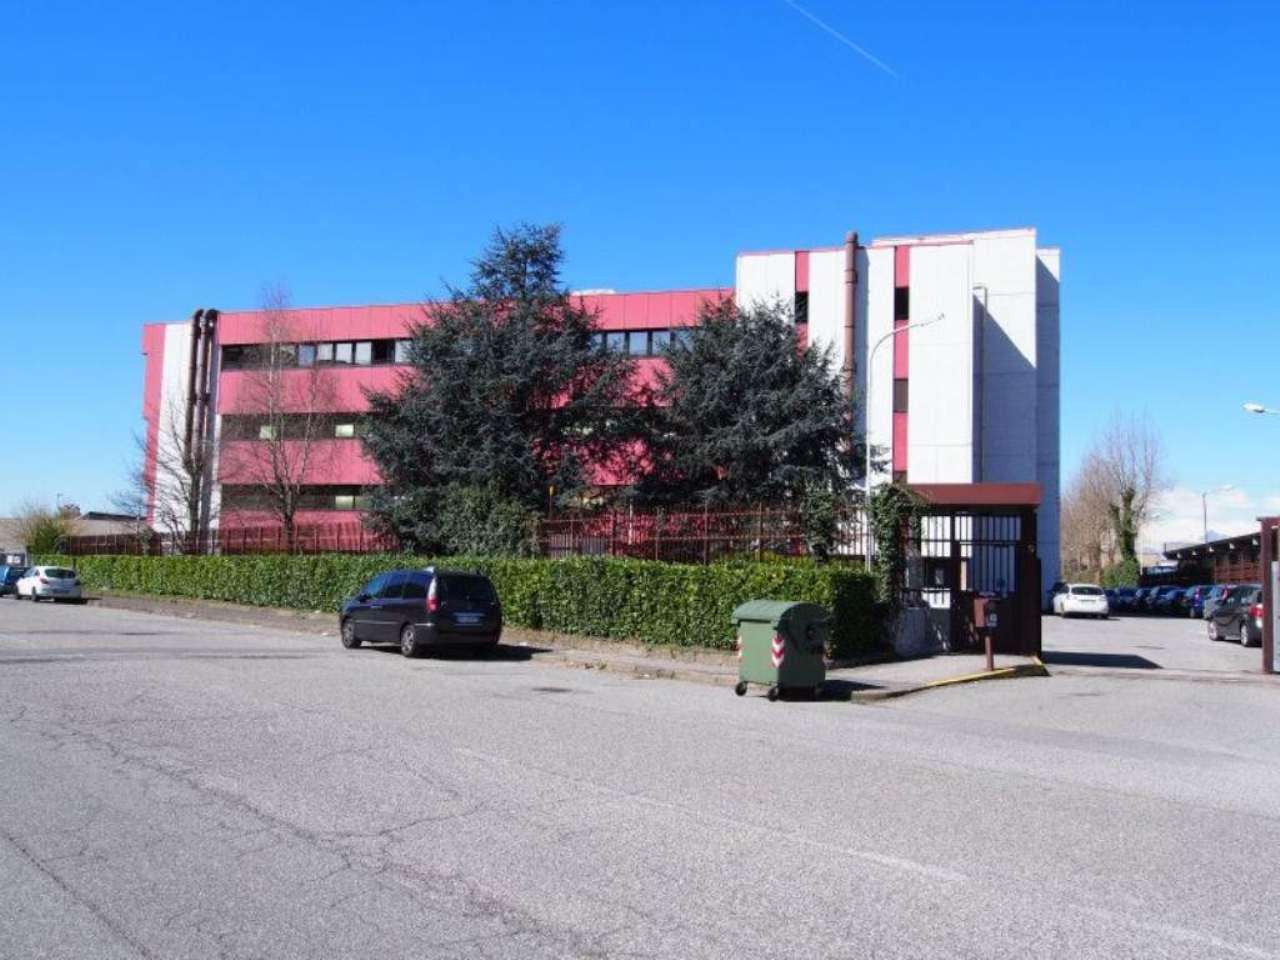 Altro in affitto via Toscana 9 San Mauro Torinese